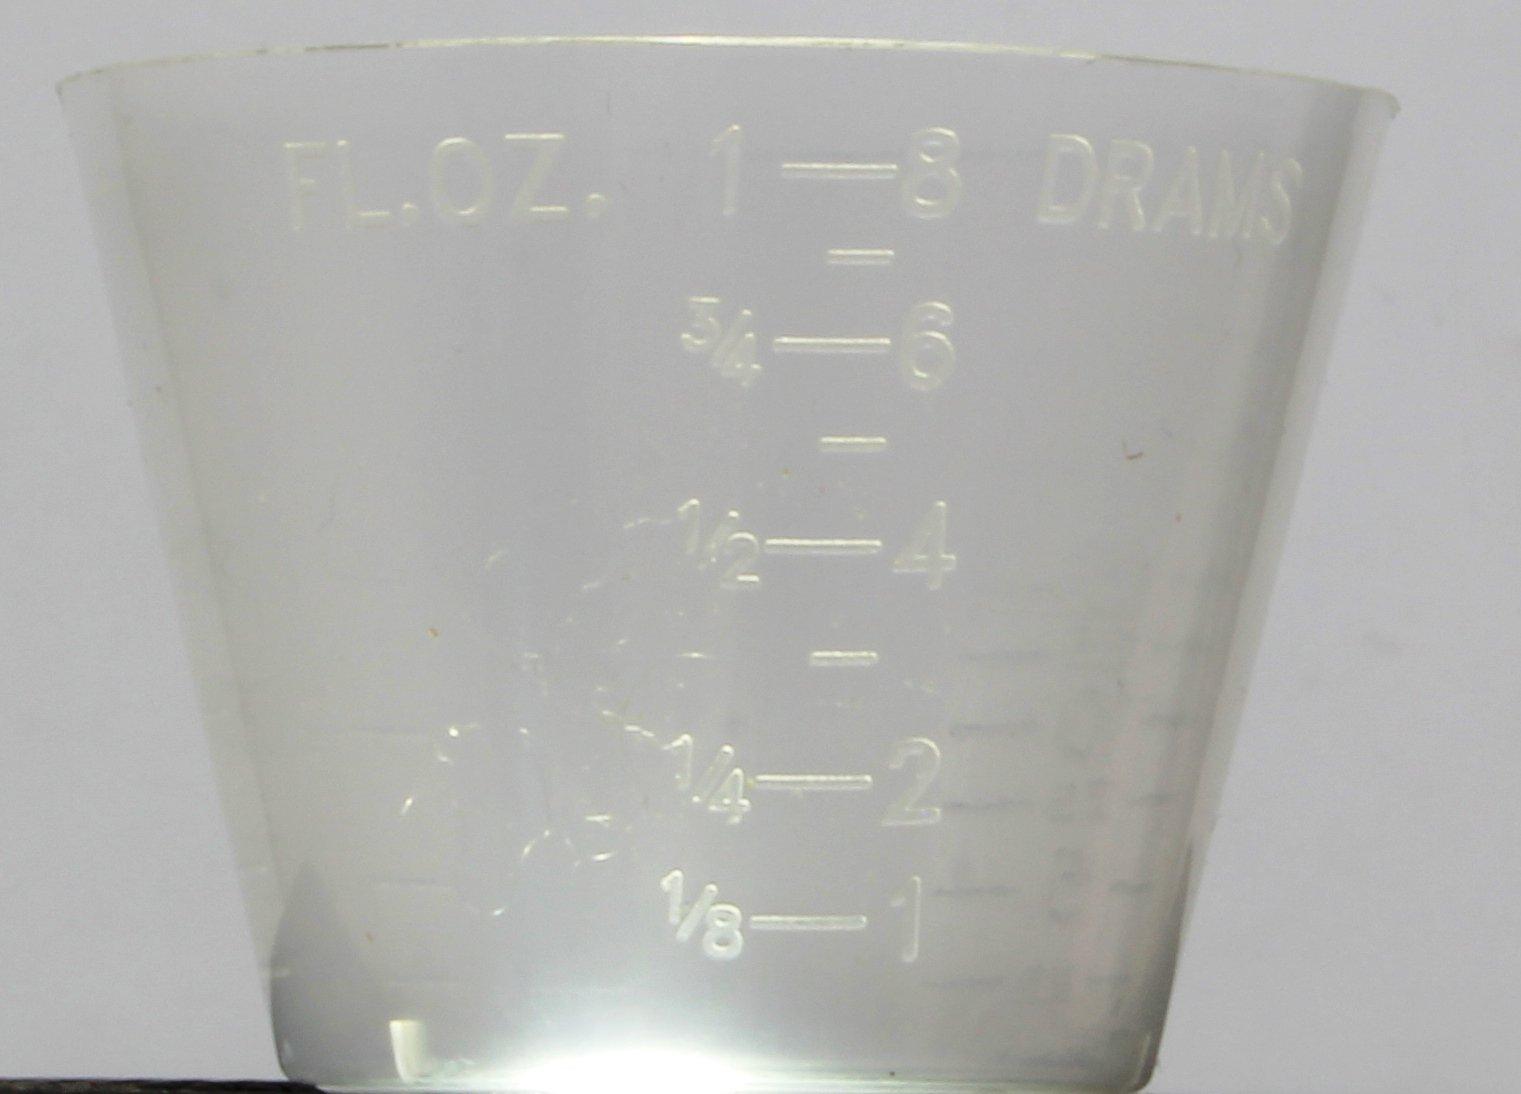 Case of 5000 NovaPlus Disposable Medicine Cups 1 oz (8 drams) / 30cc